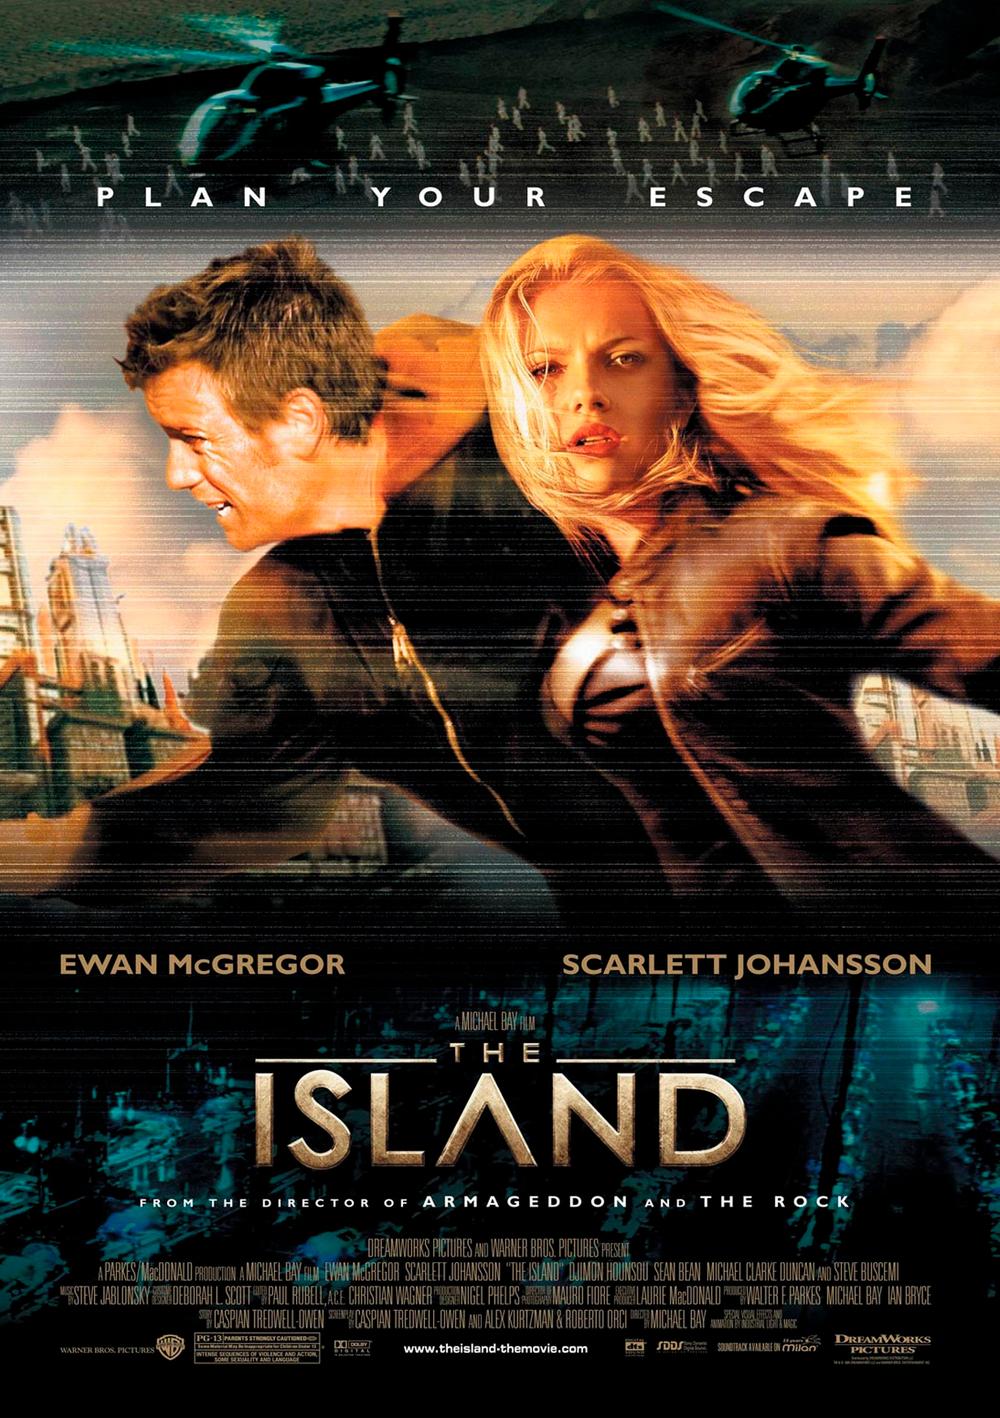 2005-The Island-01.jpg